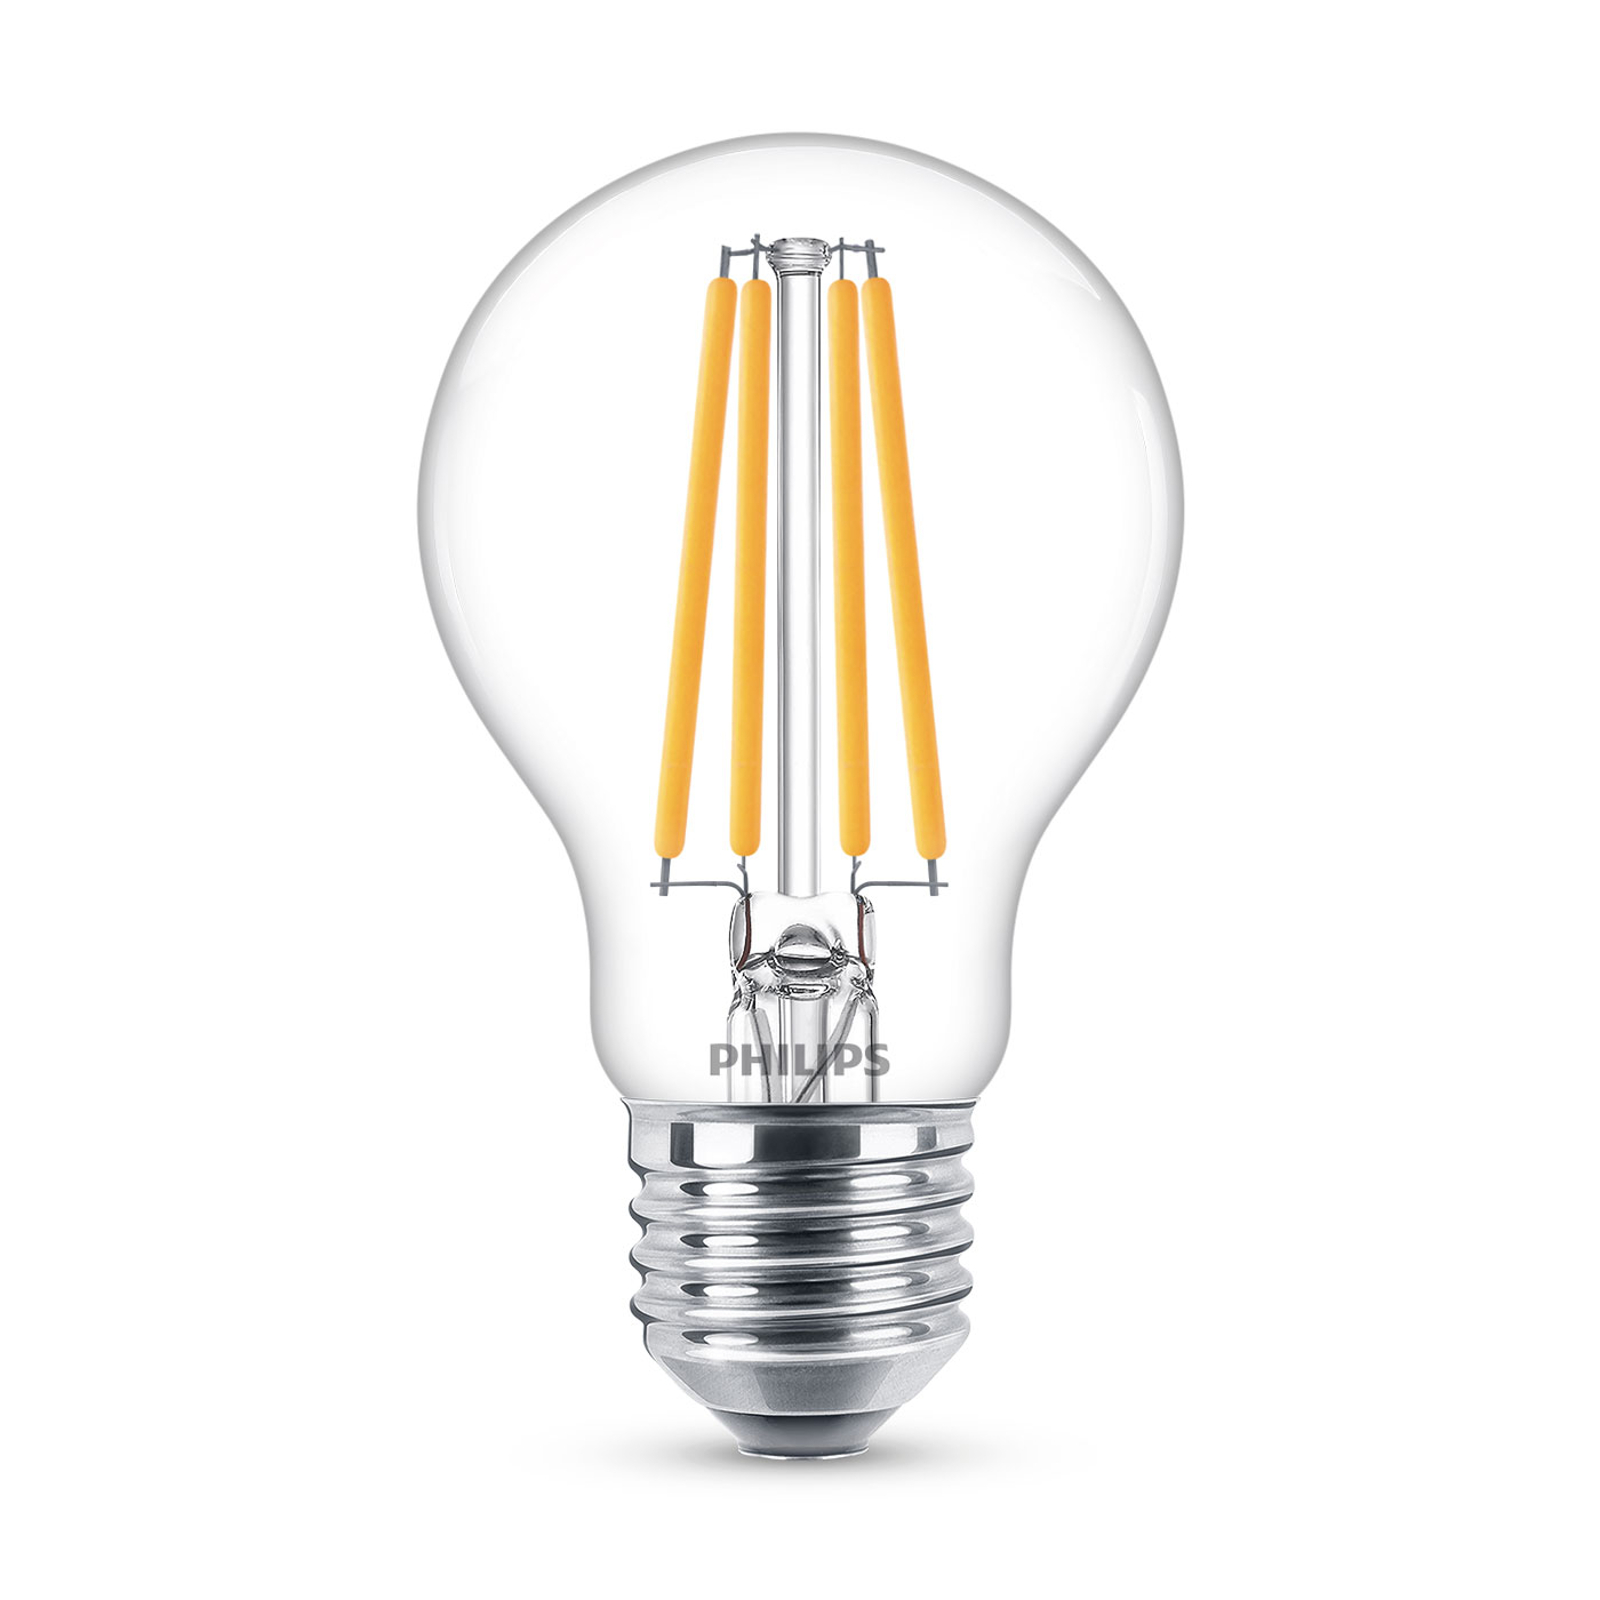 Philips Classic żarówka LED E27 A60 10,5W 4000K